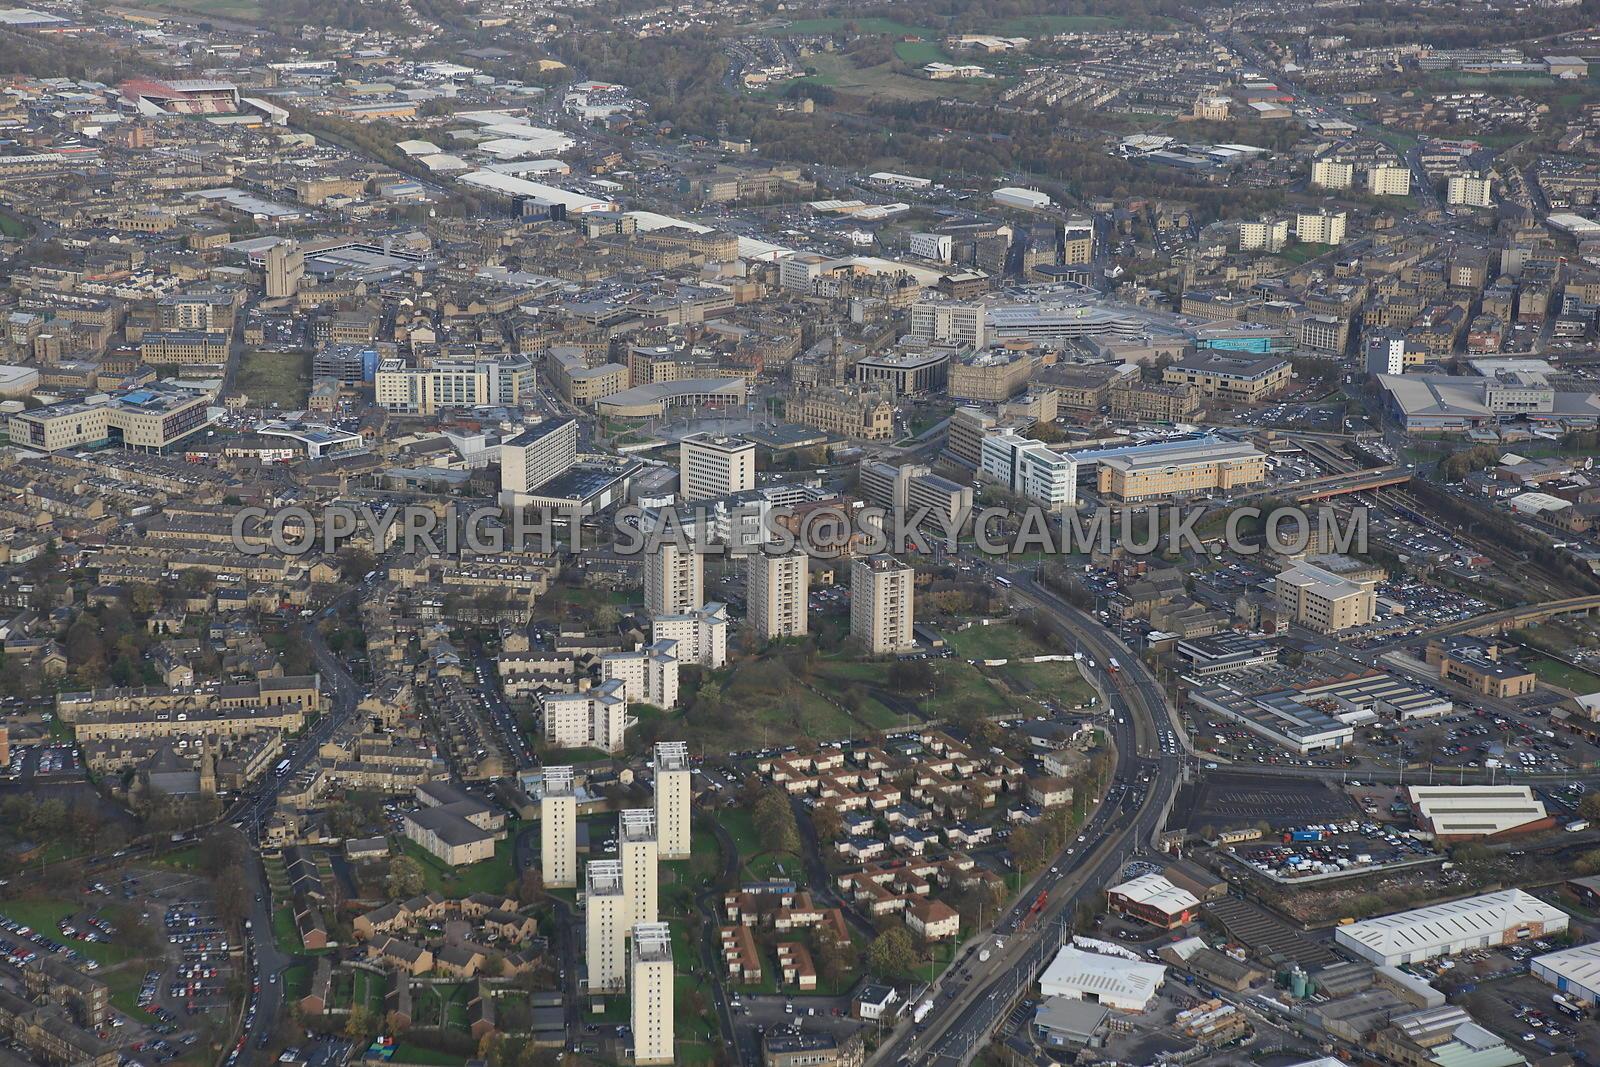 City Park Property Management Bradford